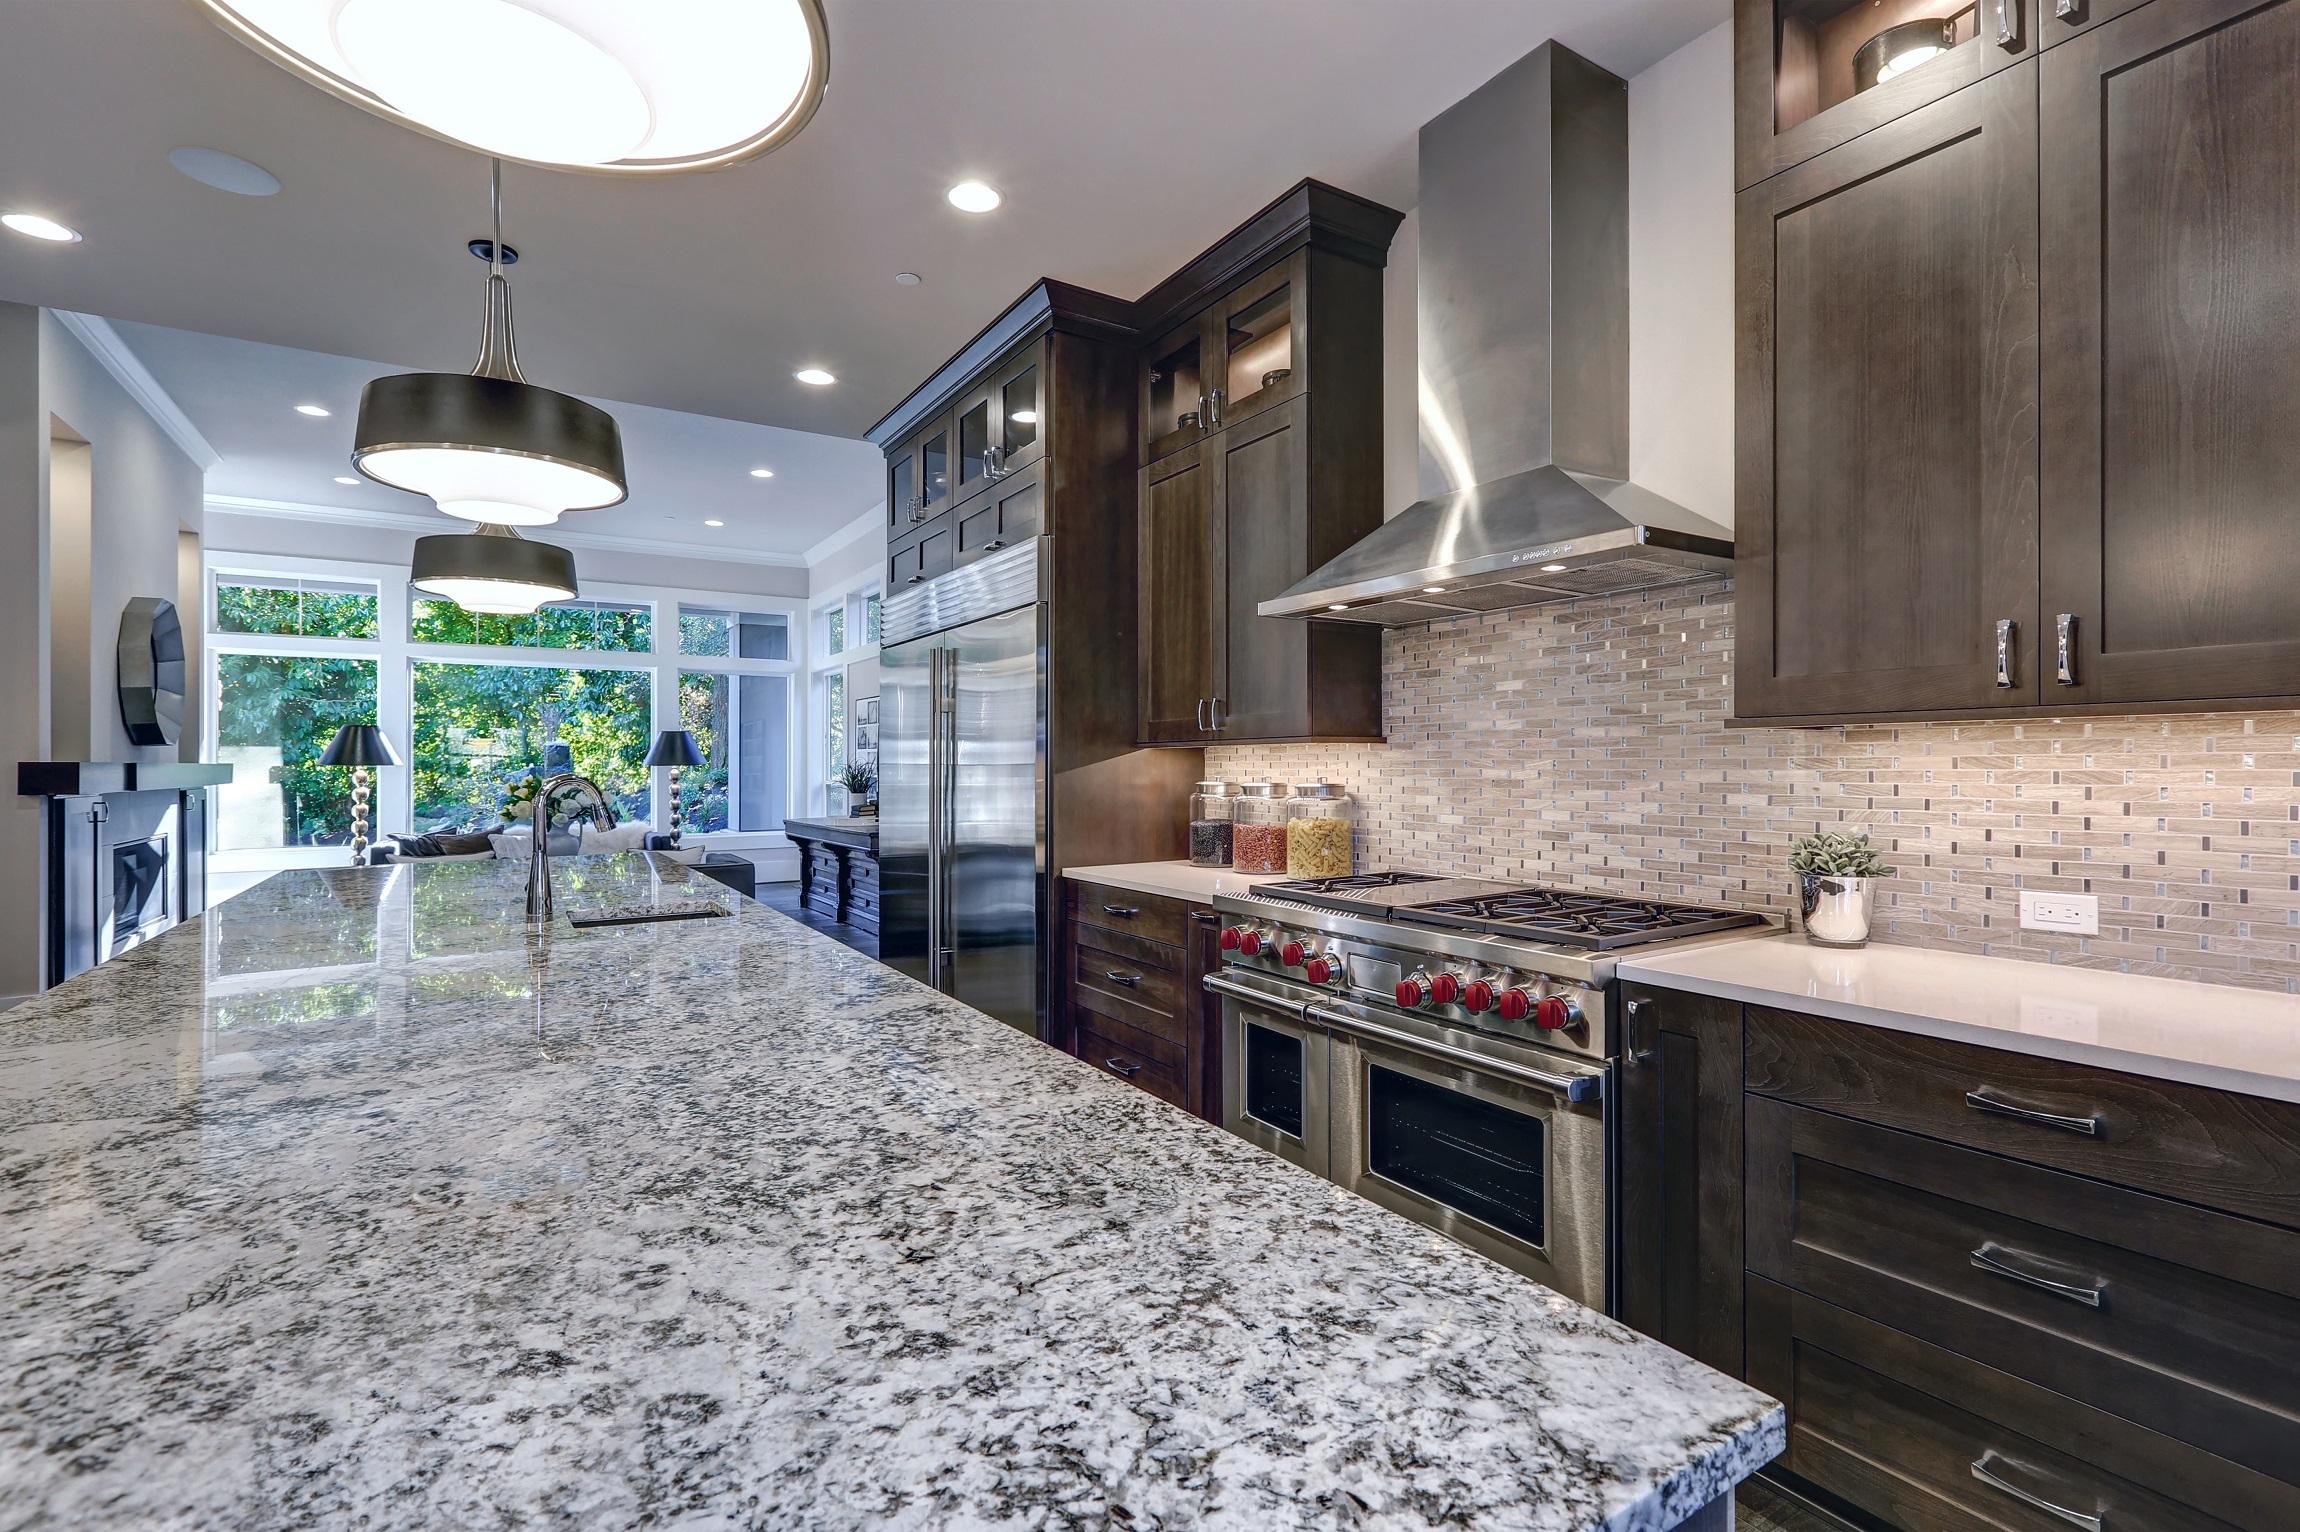 Home - American Granite Designs   Granite, Kitchens, and Baths